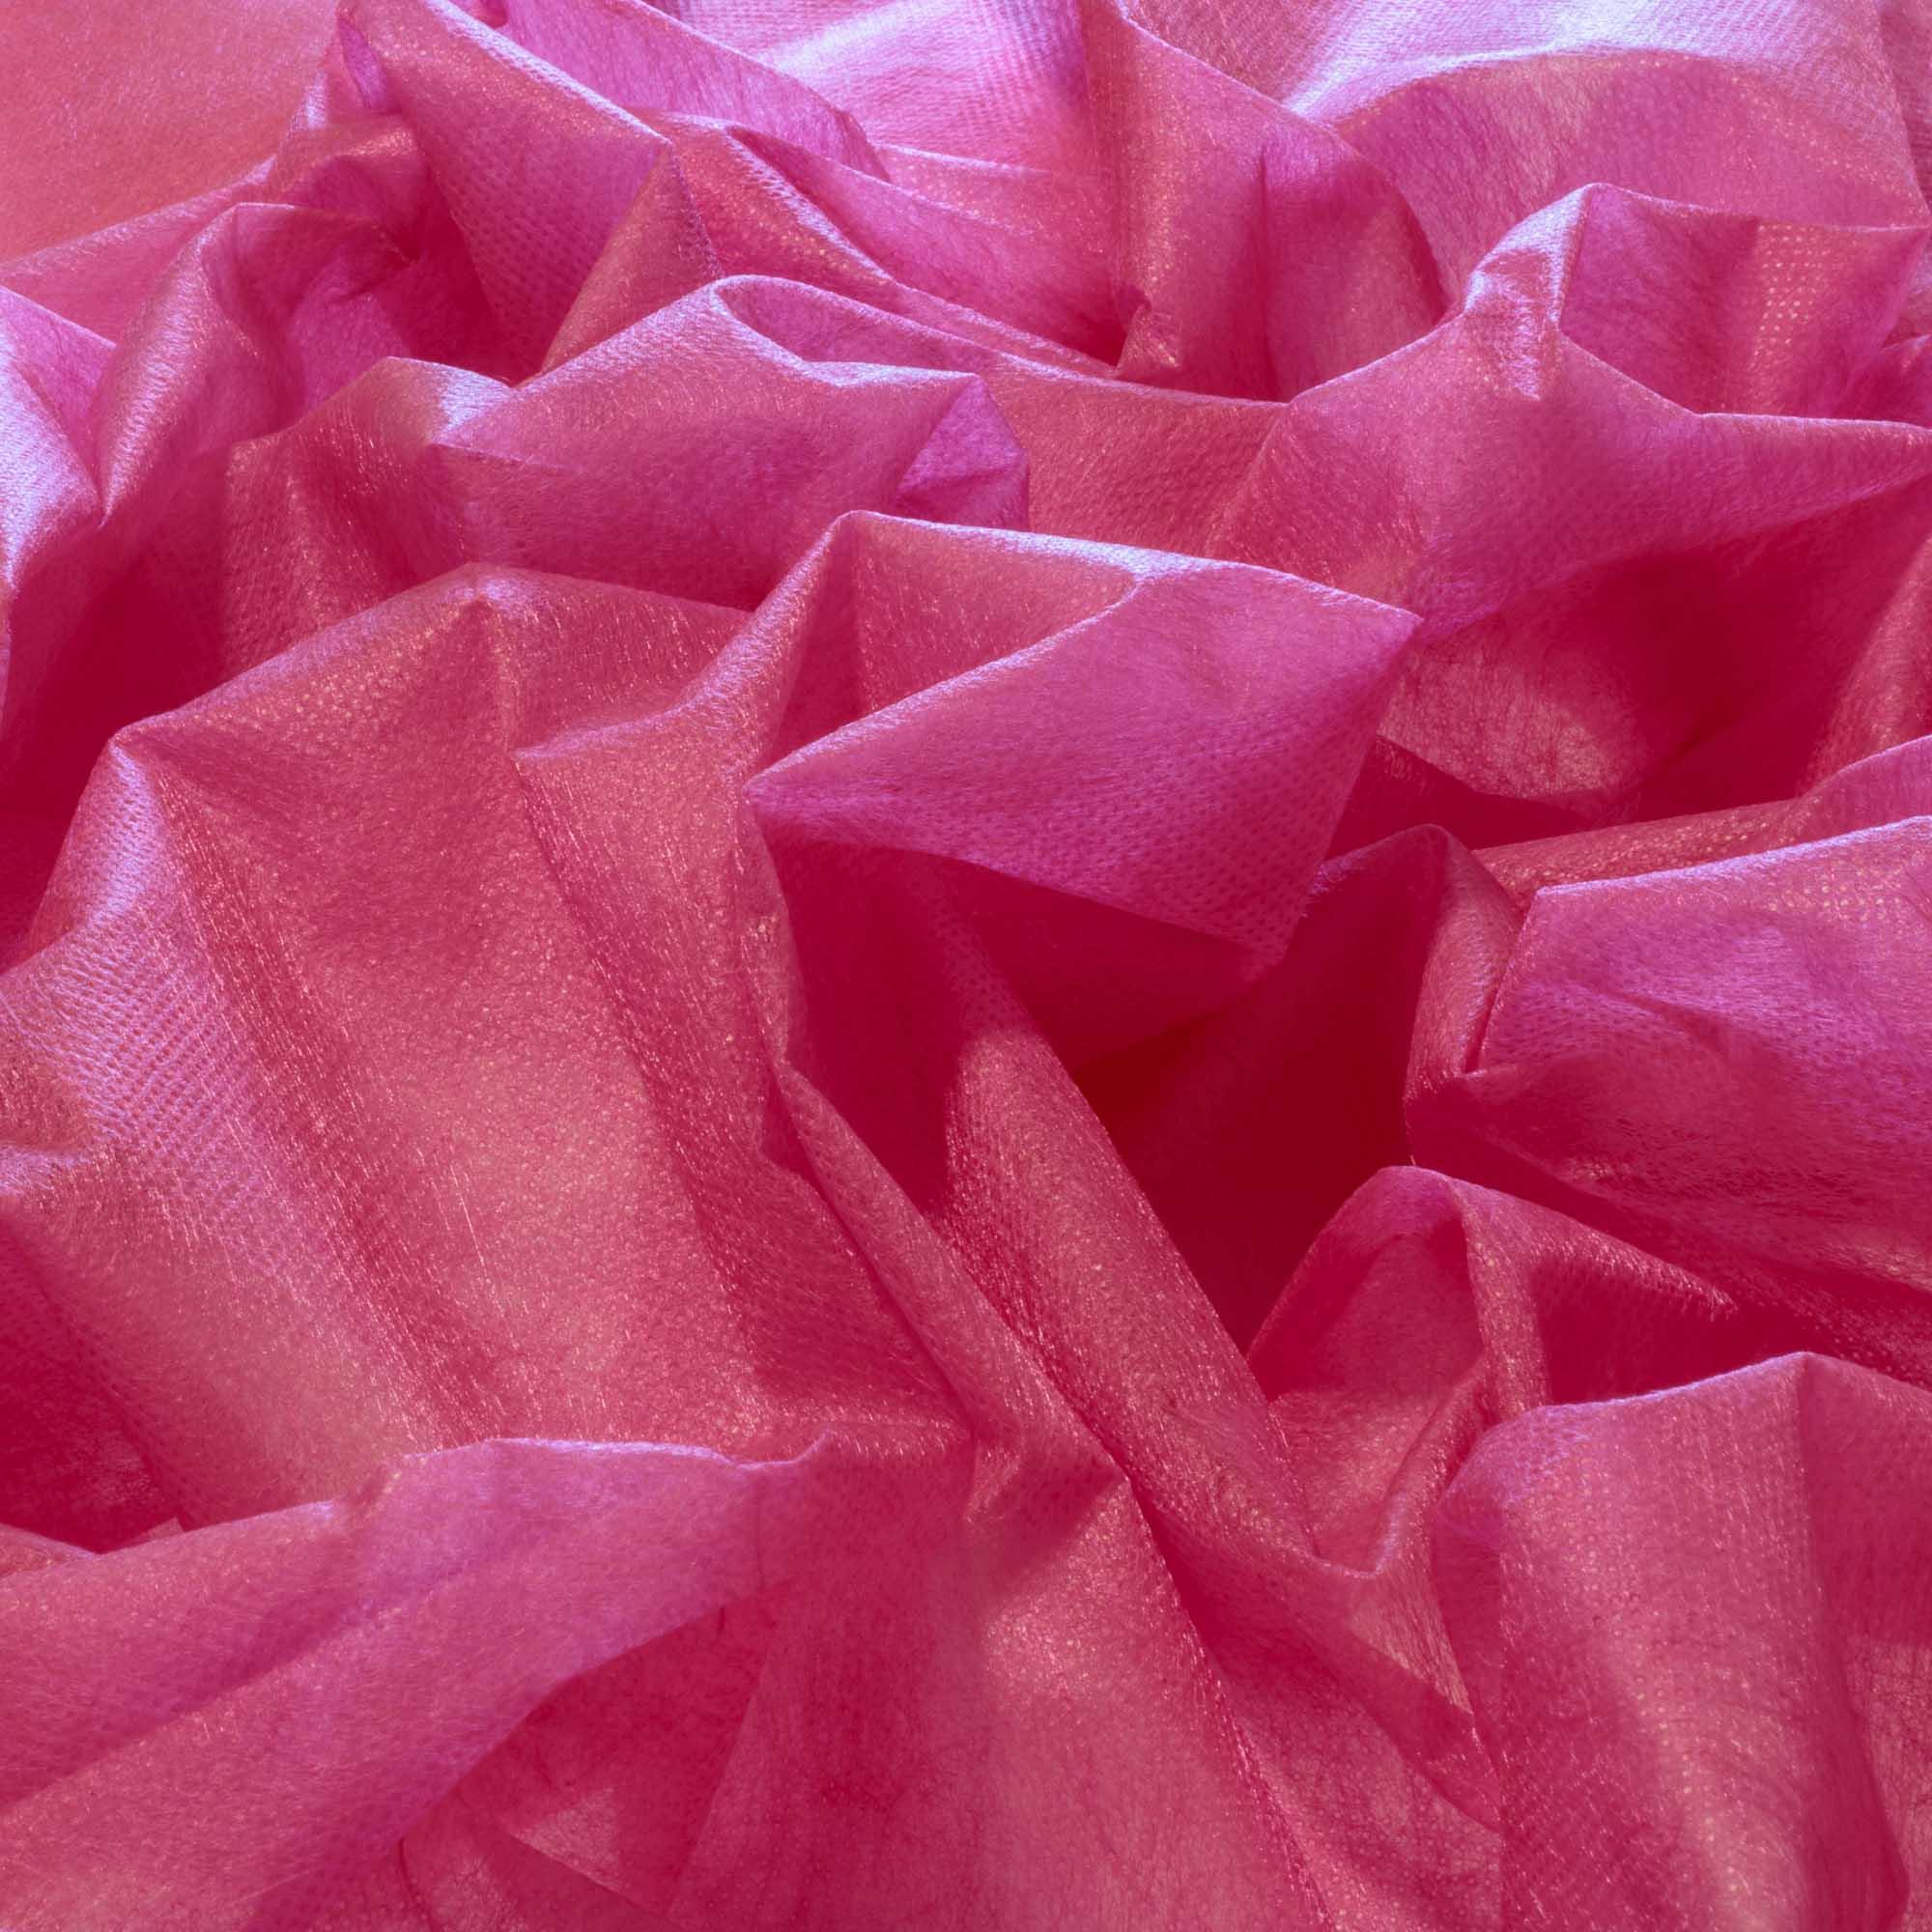 Tecido TNT Rosa Pink 100% Poliamida 1,40 m Largura